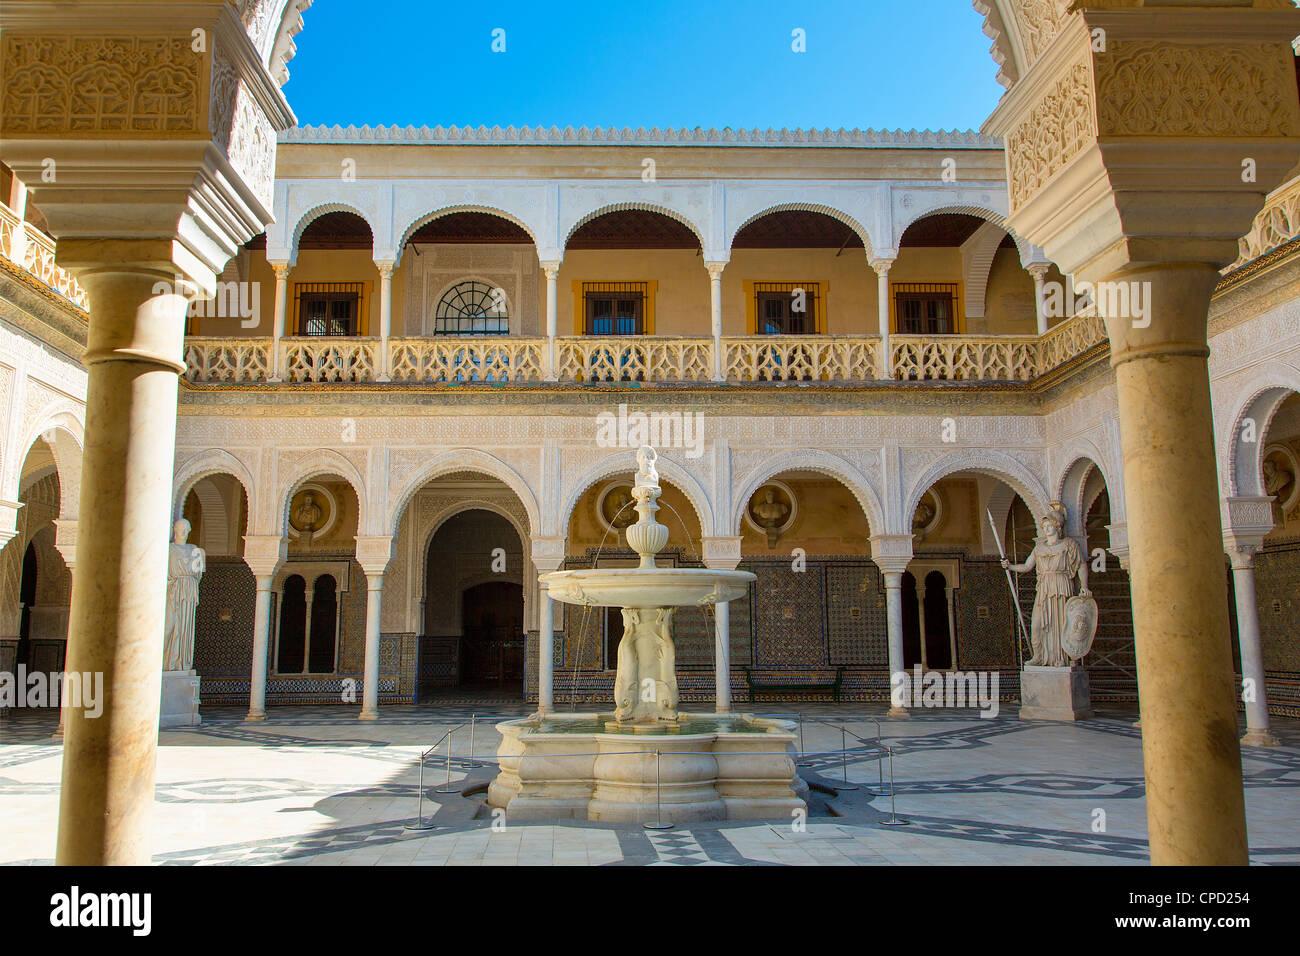 L'Europe, Espagne Andalousie, Sevilla, Patio de la Casa de Pilatos Photo Stock